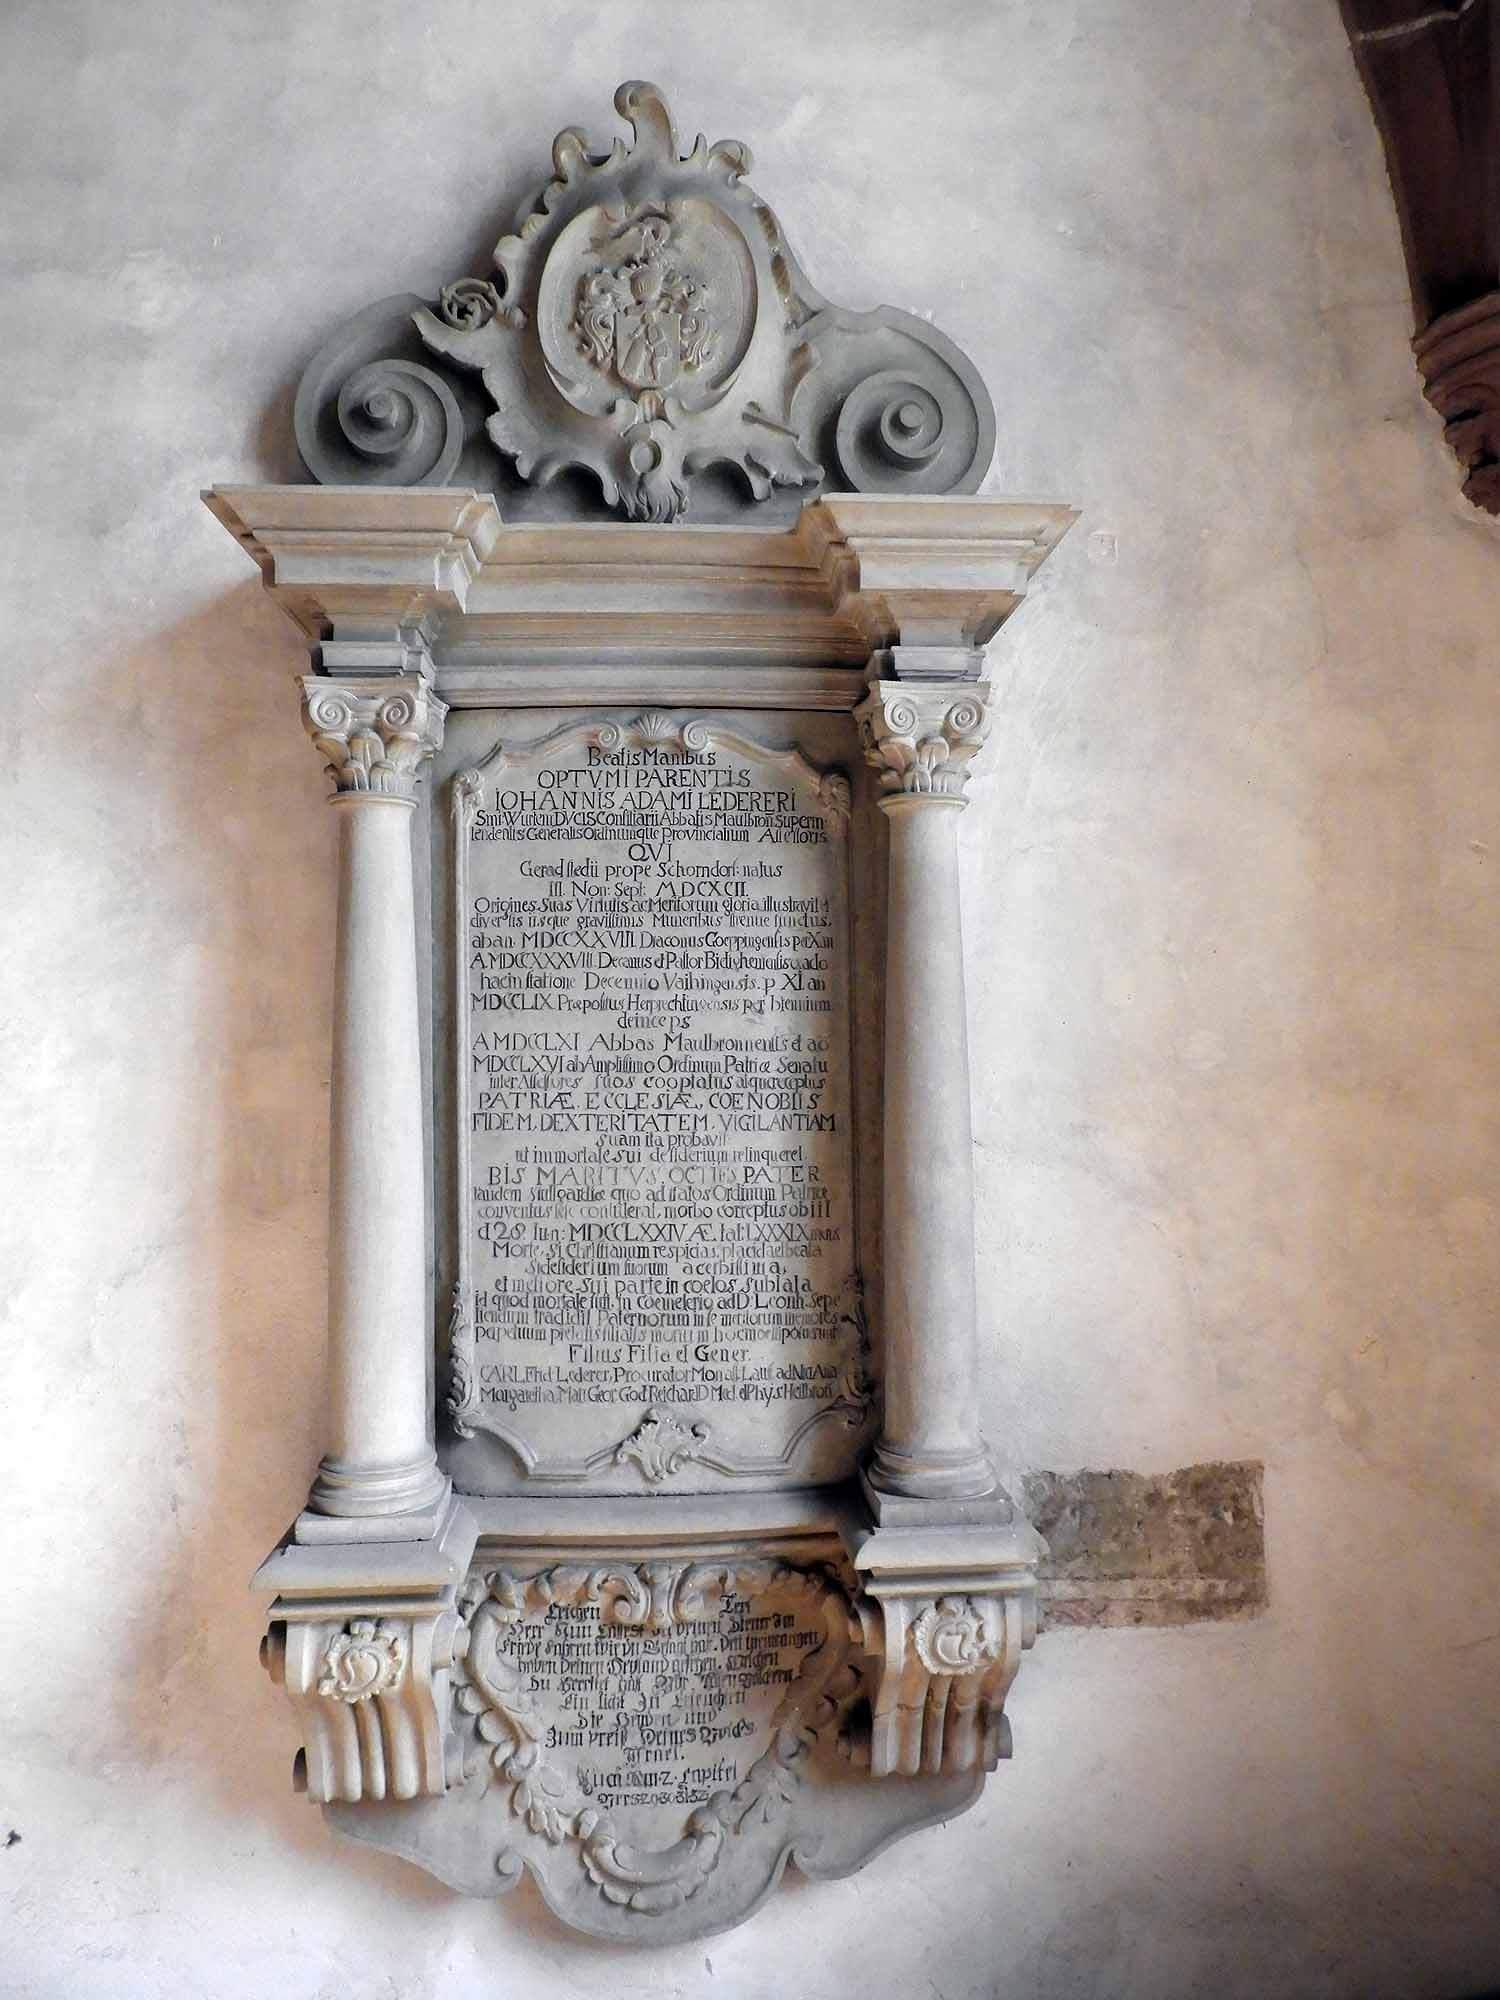 germany-kloster-maulbronn-stone-tablet.JPG